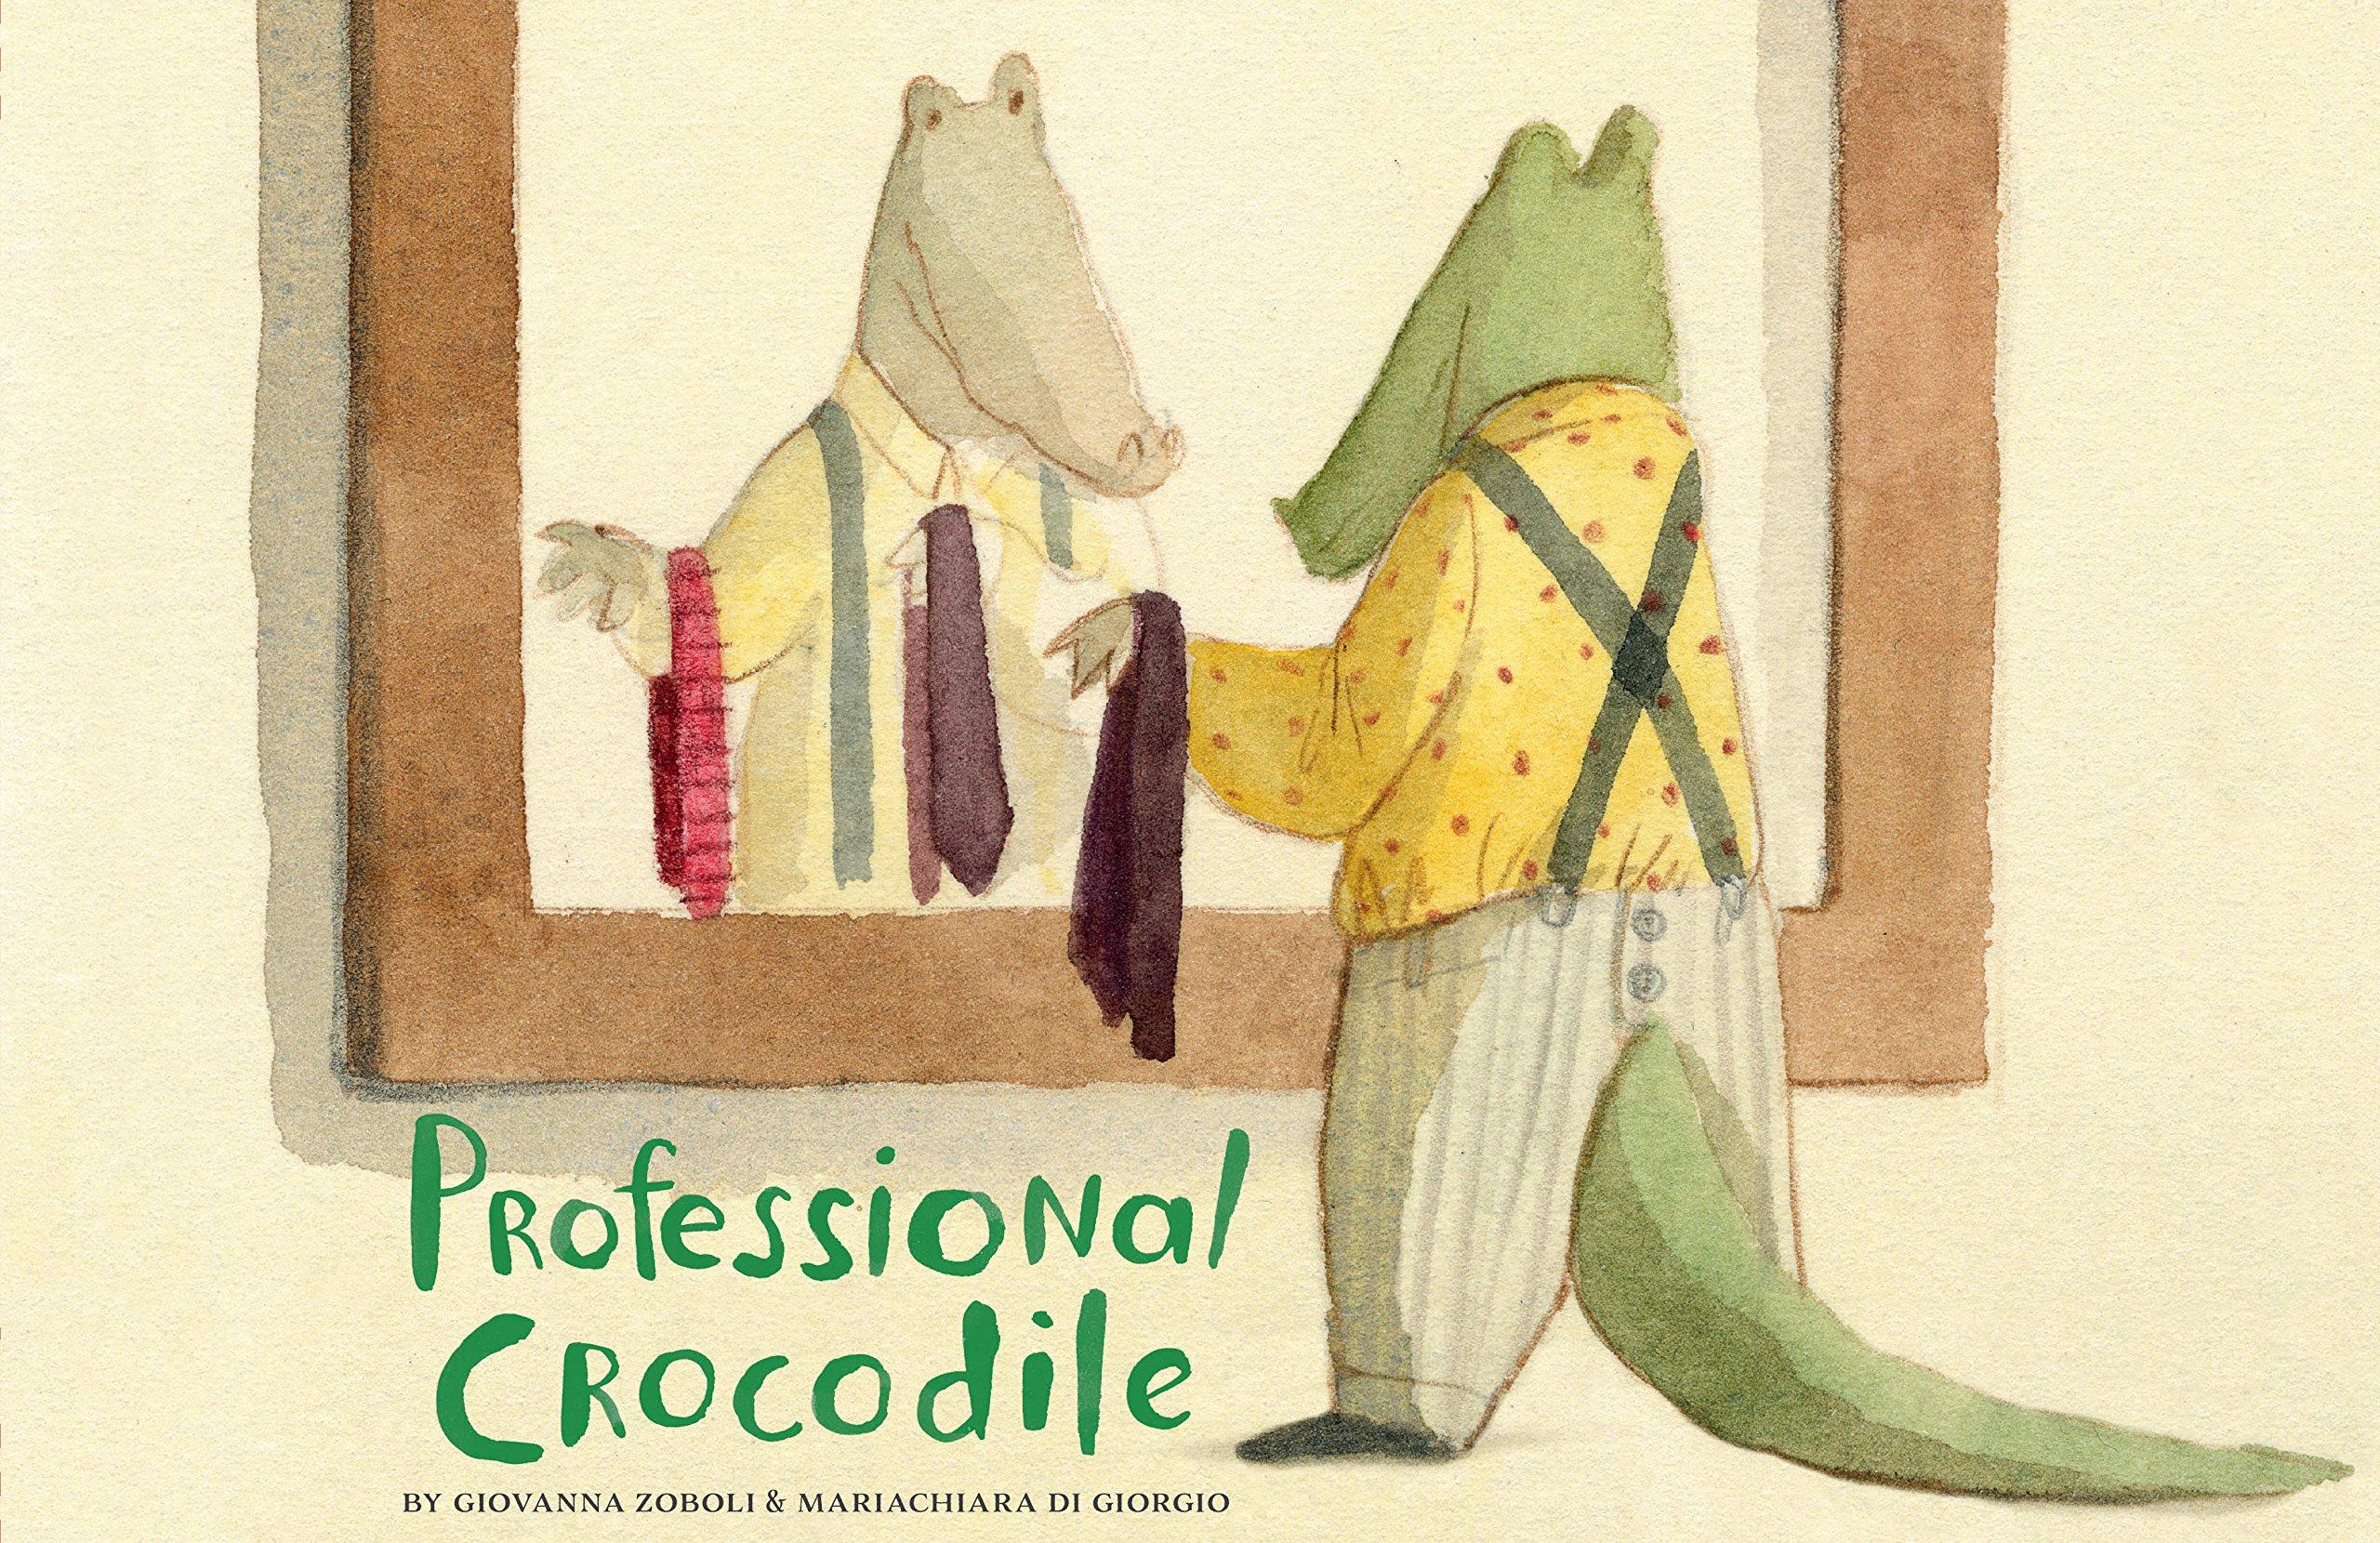 英文原版 鳄鱼的一天 Giovanna Zoboli & Mariachiara Di Giorgio 精装绘本 Professional Crocodile